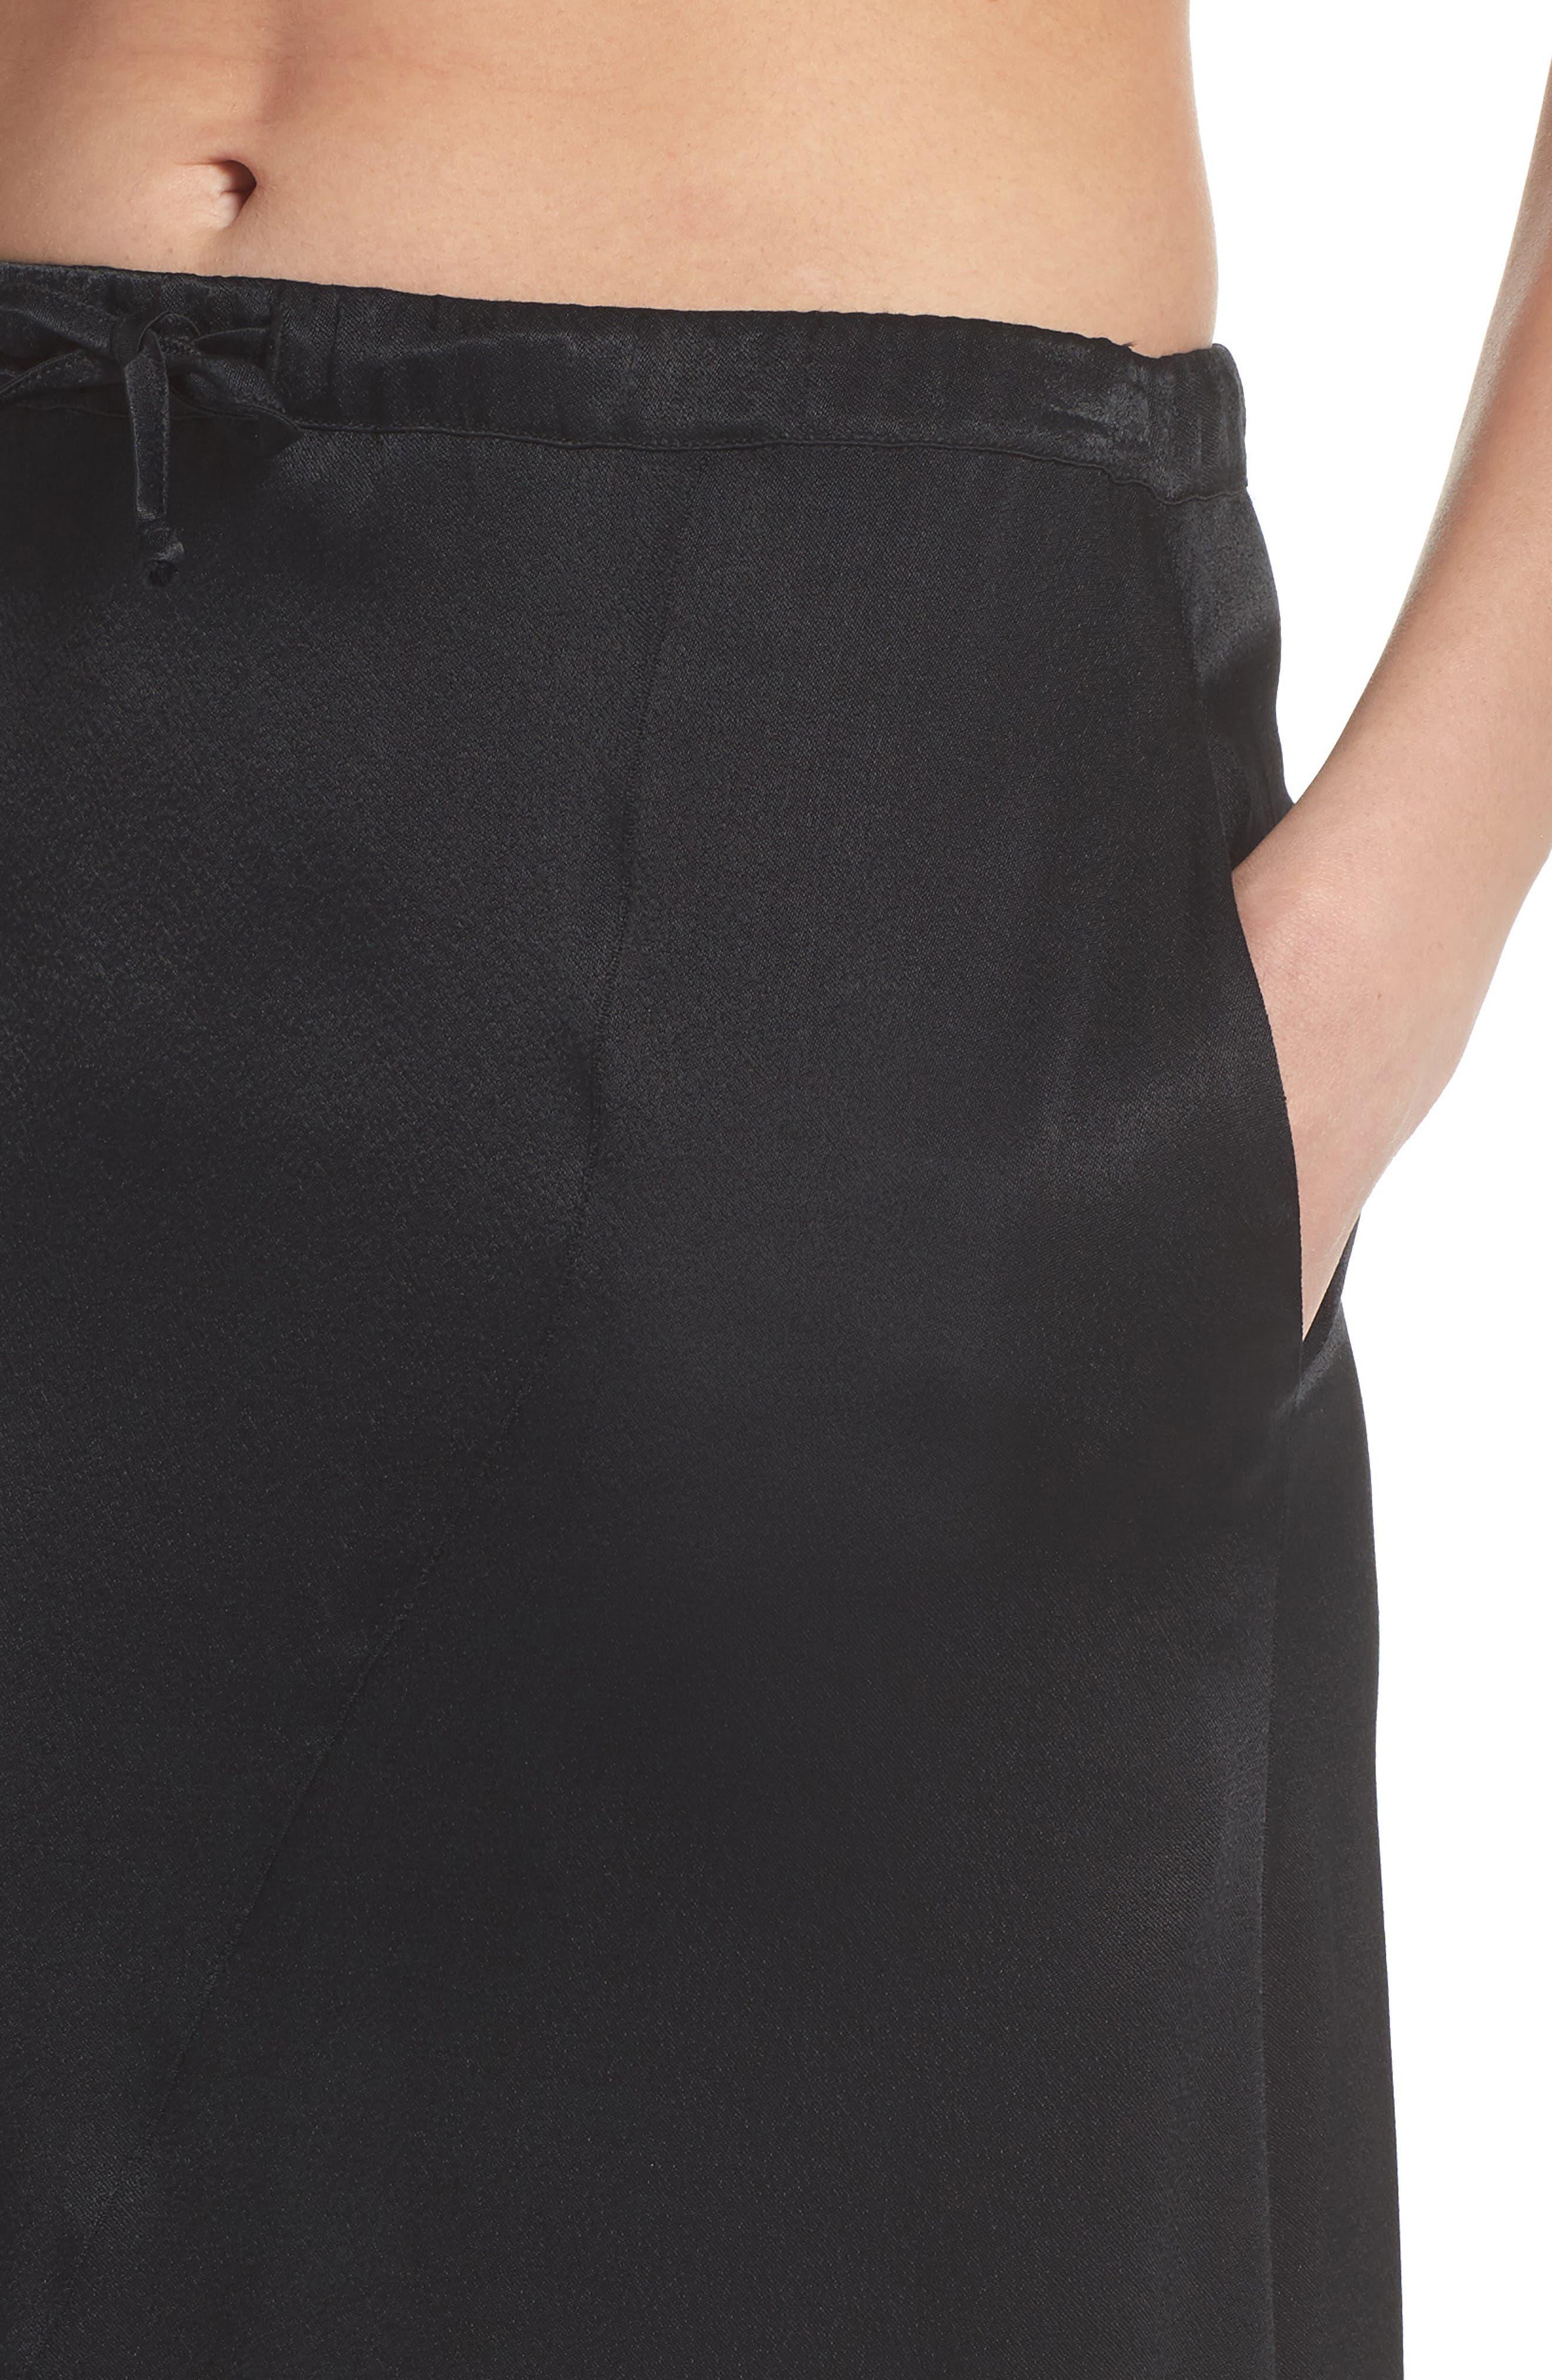 Lace Trim Slip Skirt,                             Alternate thumbnail 4, color,                             001